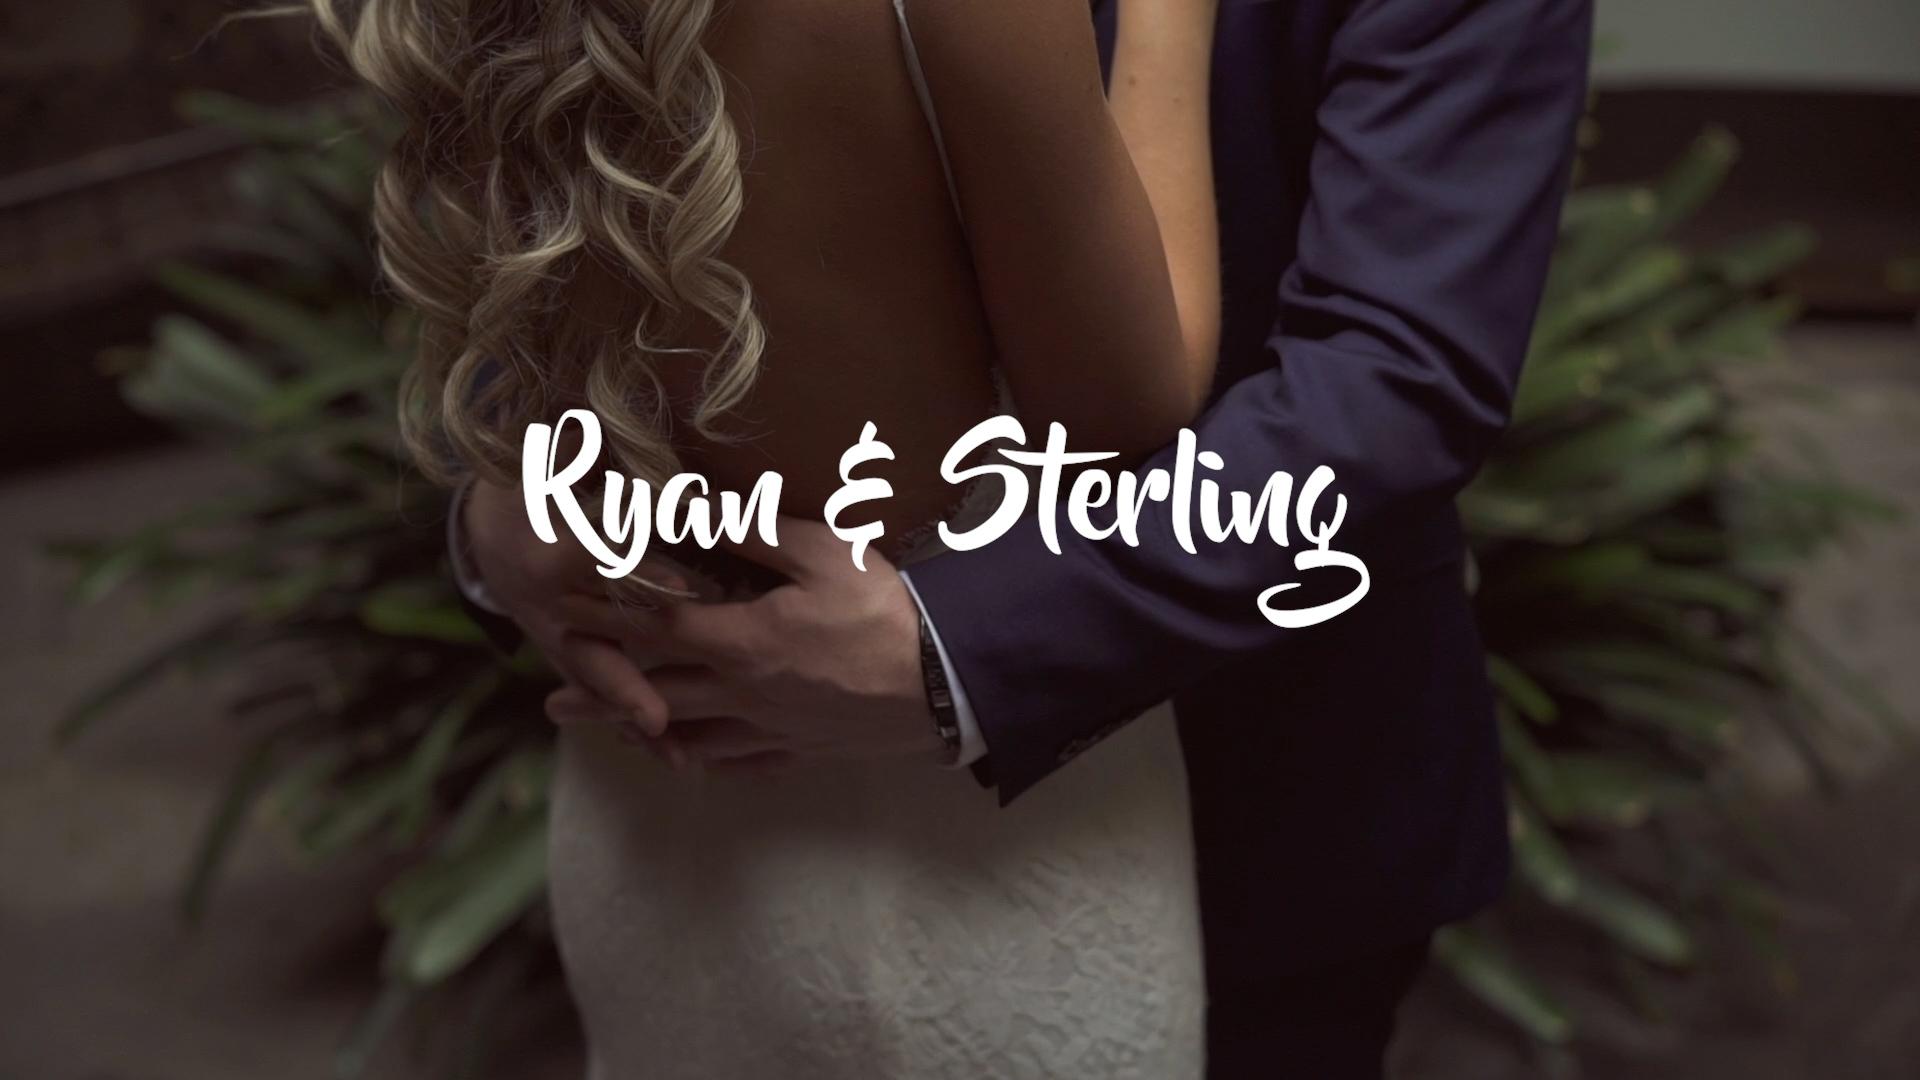 Sterling + Ryan | Barcelona, Spain | Labyrinth